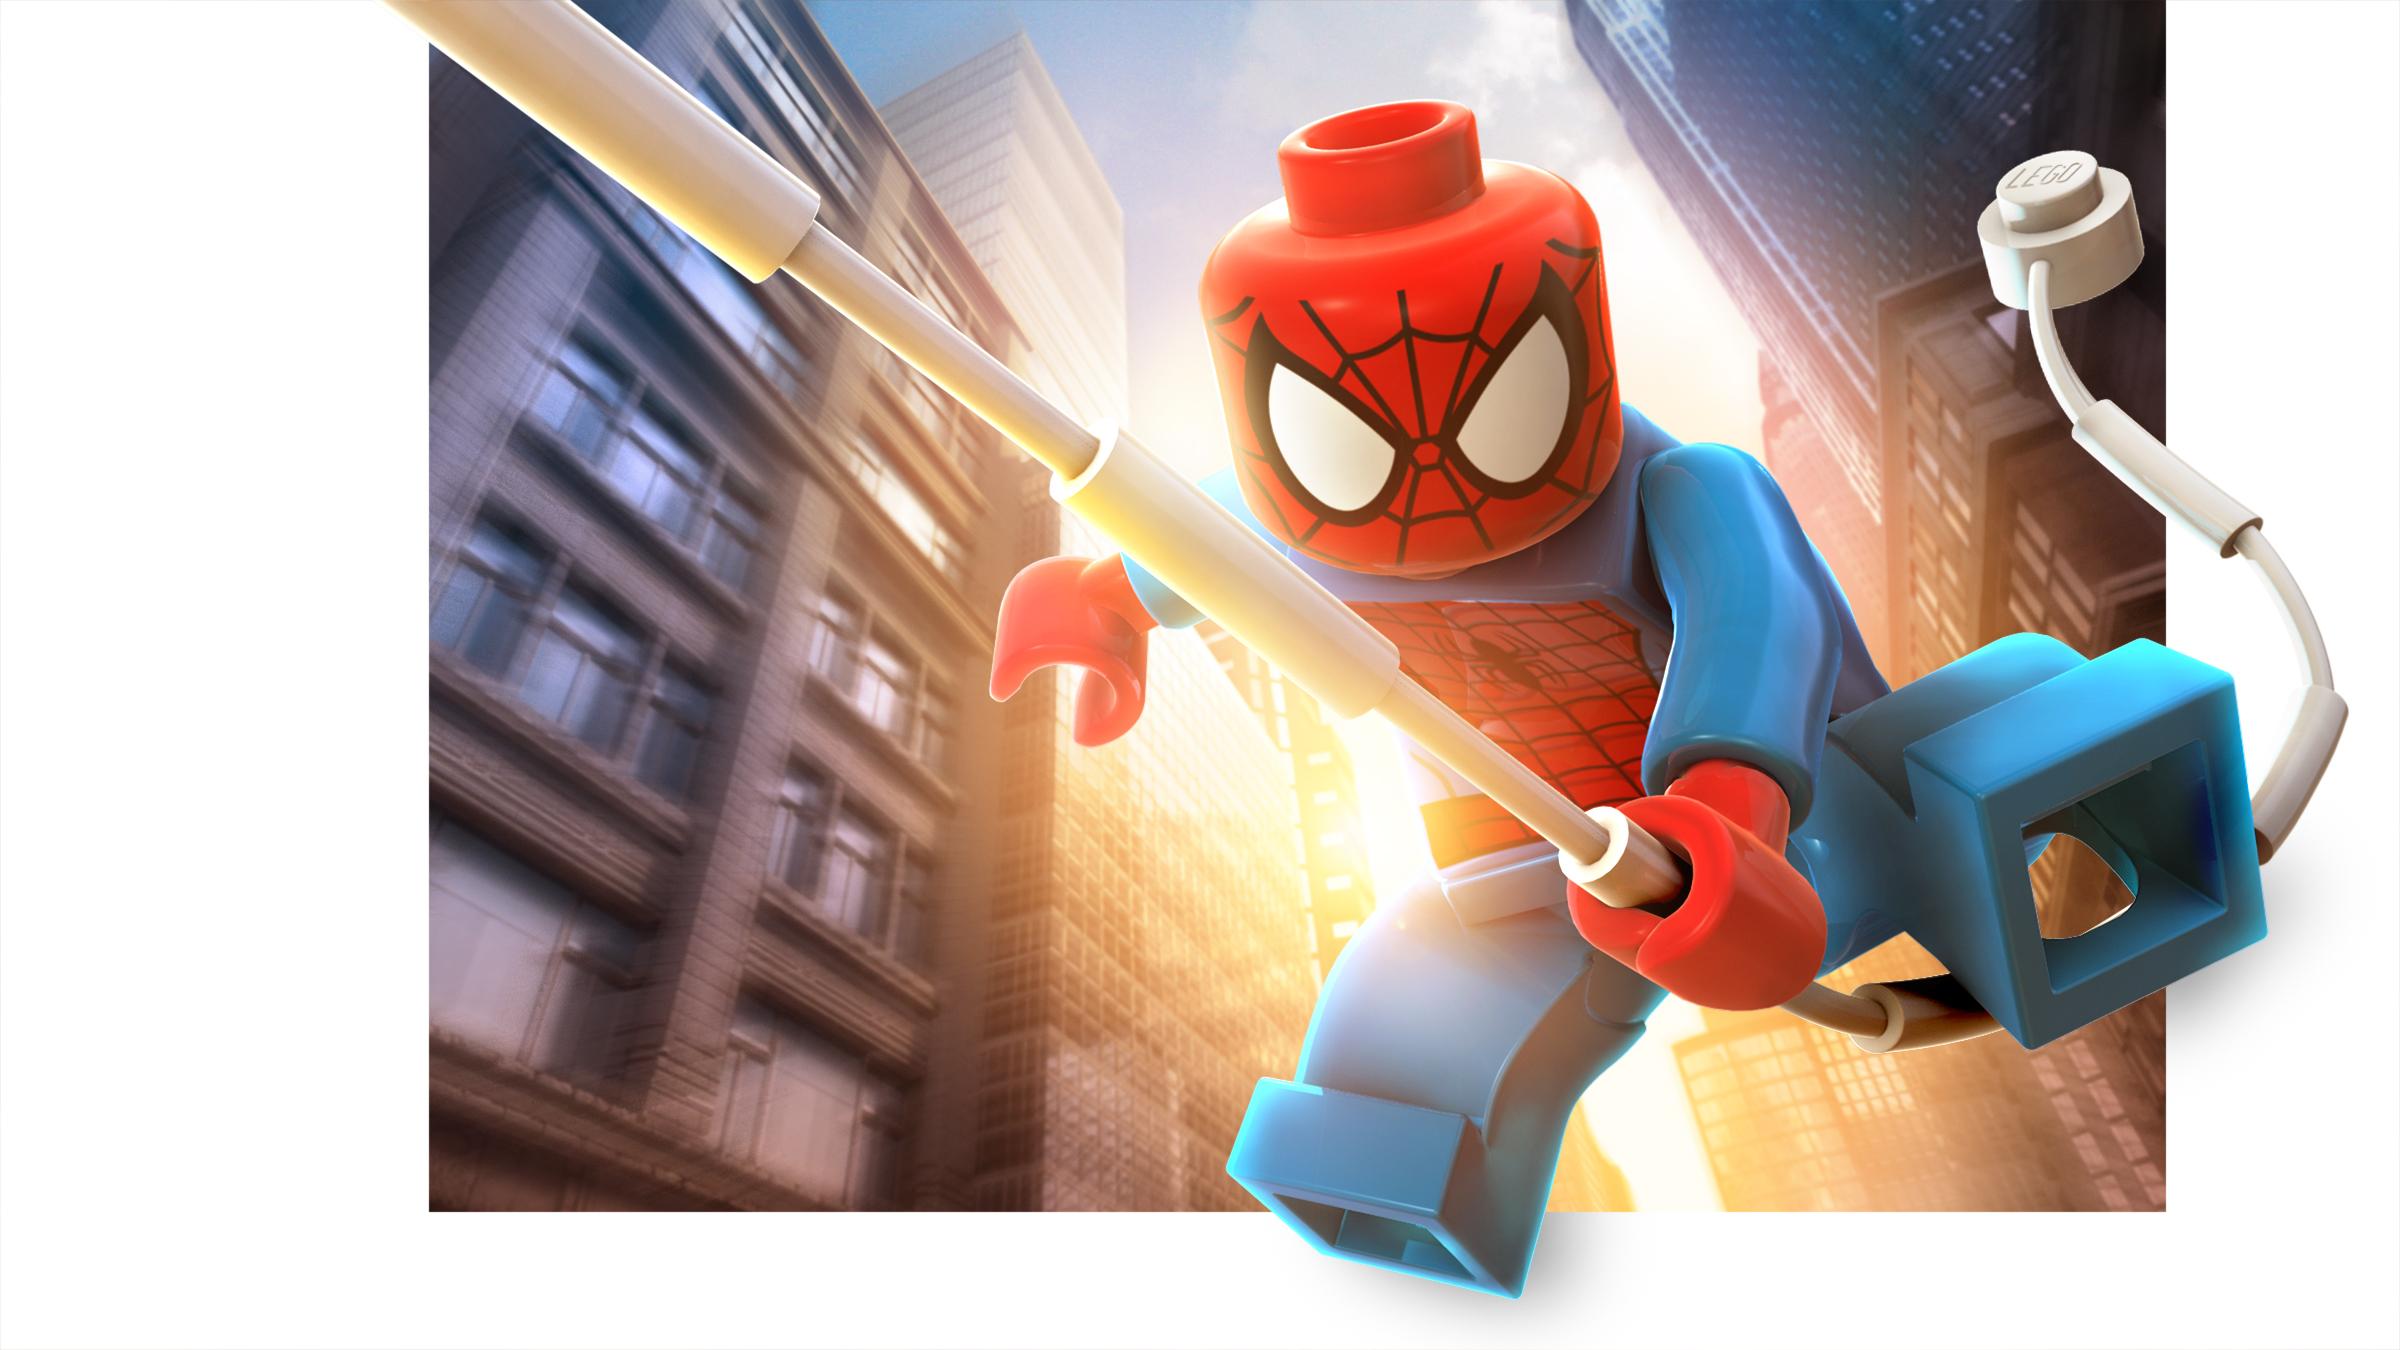 Lego spider man the video game idea wiki - Spiderman batman lego ...